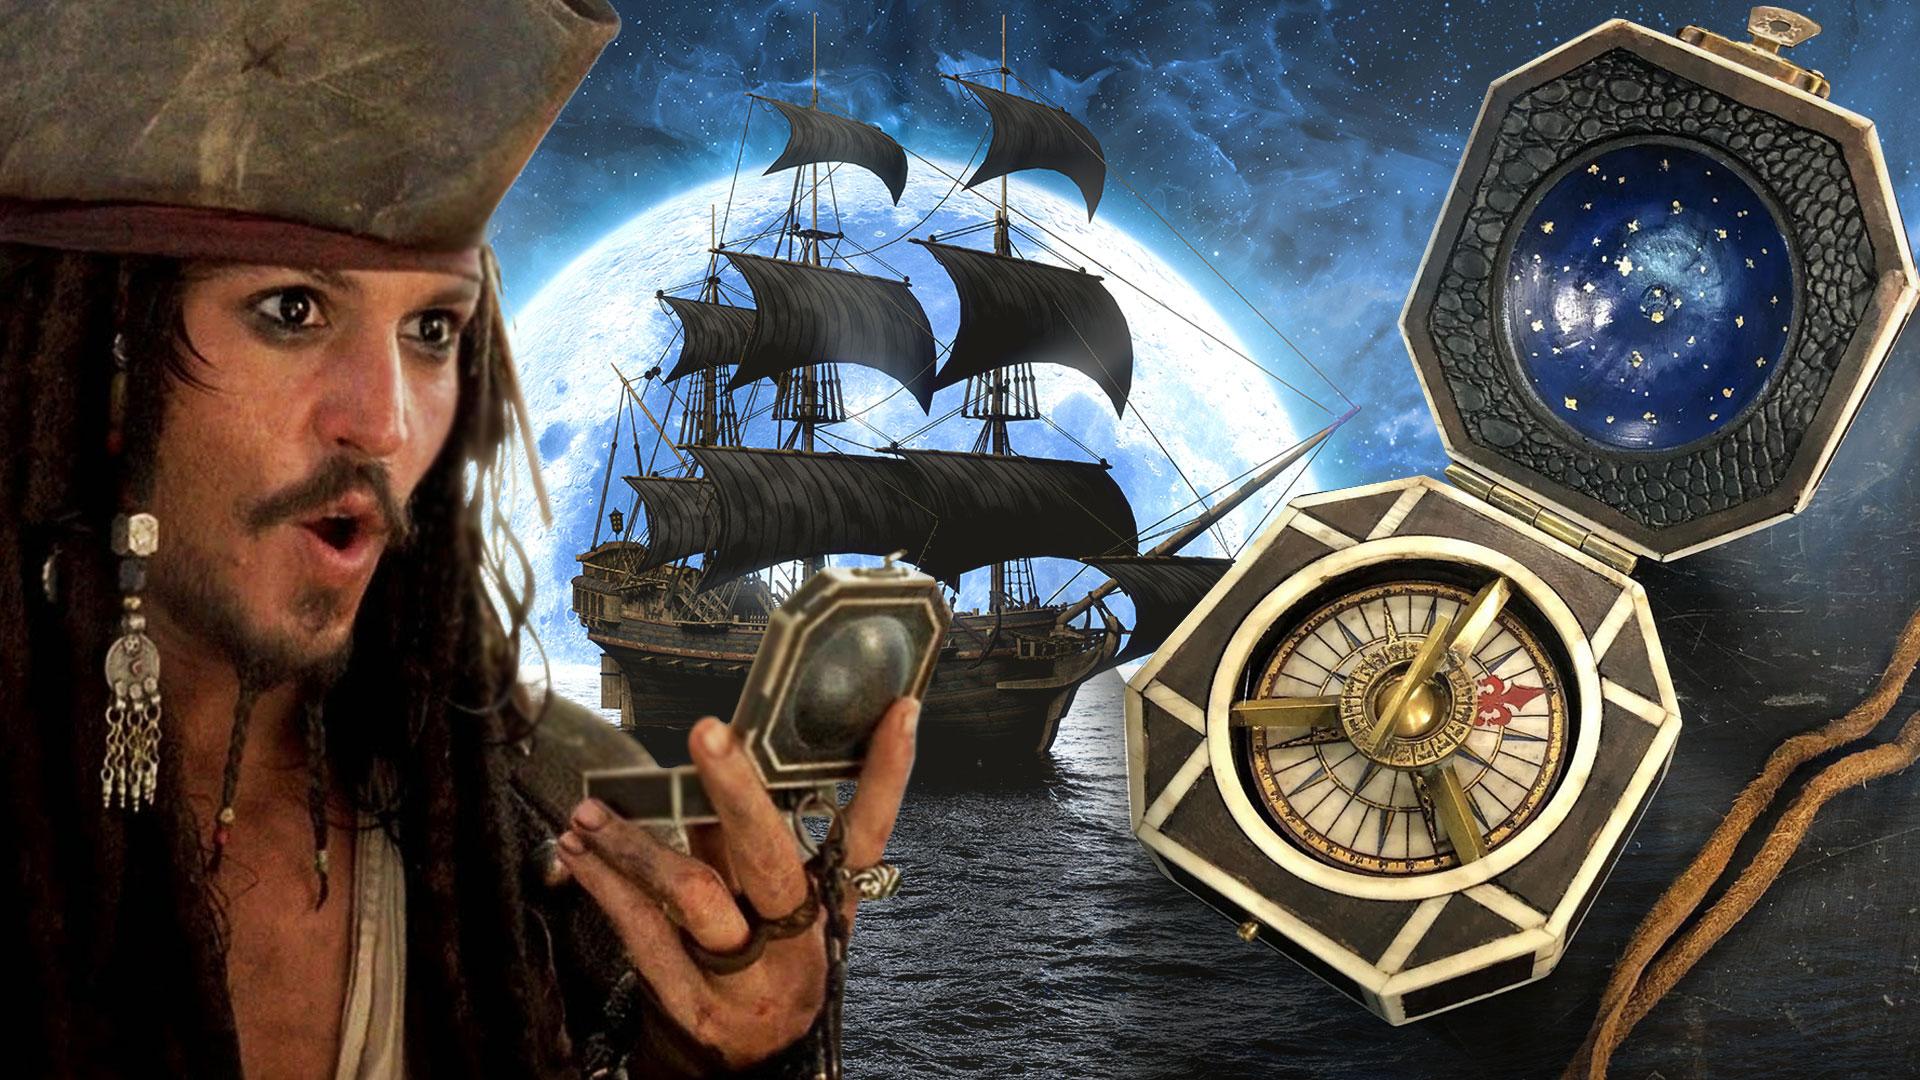 La bussola di Jack Sparrow